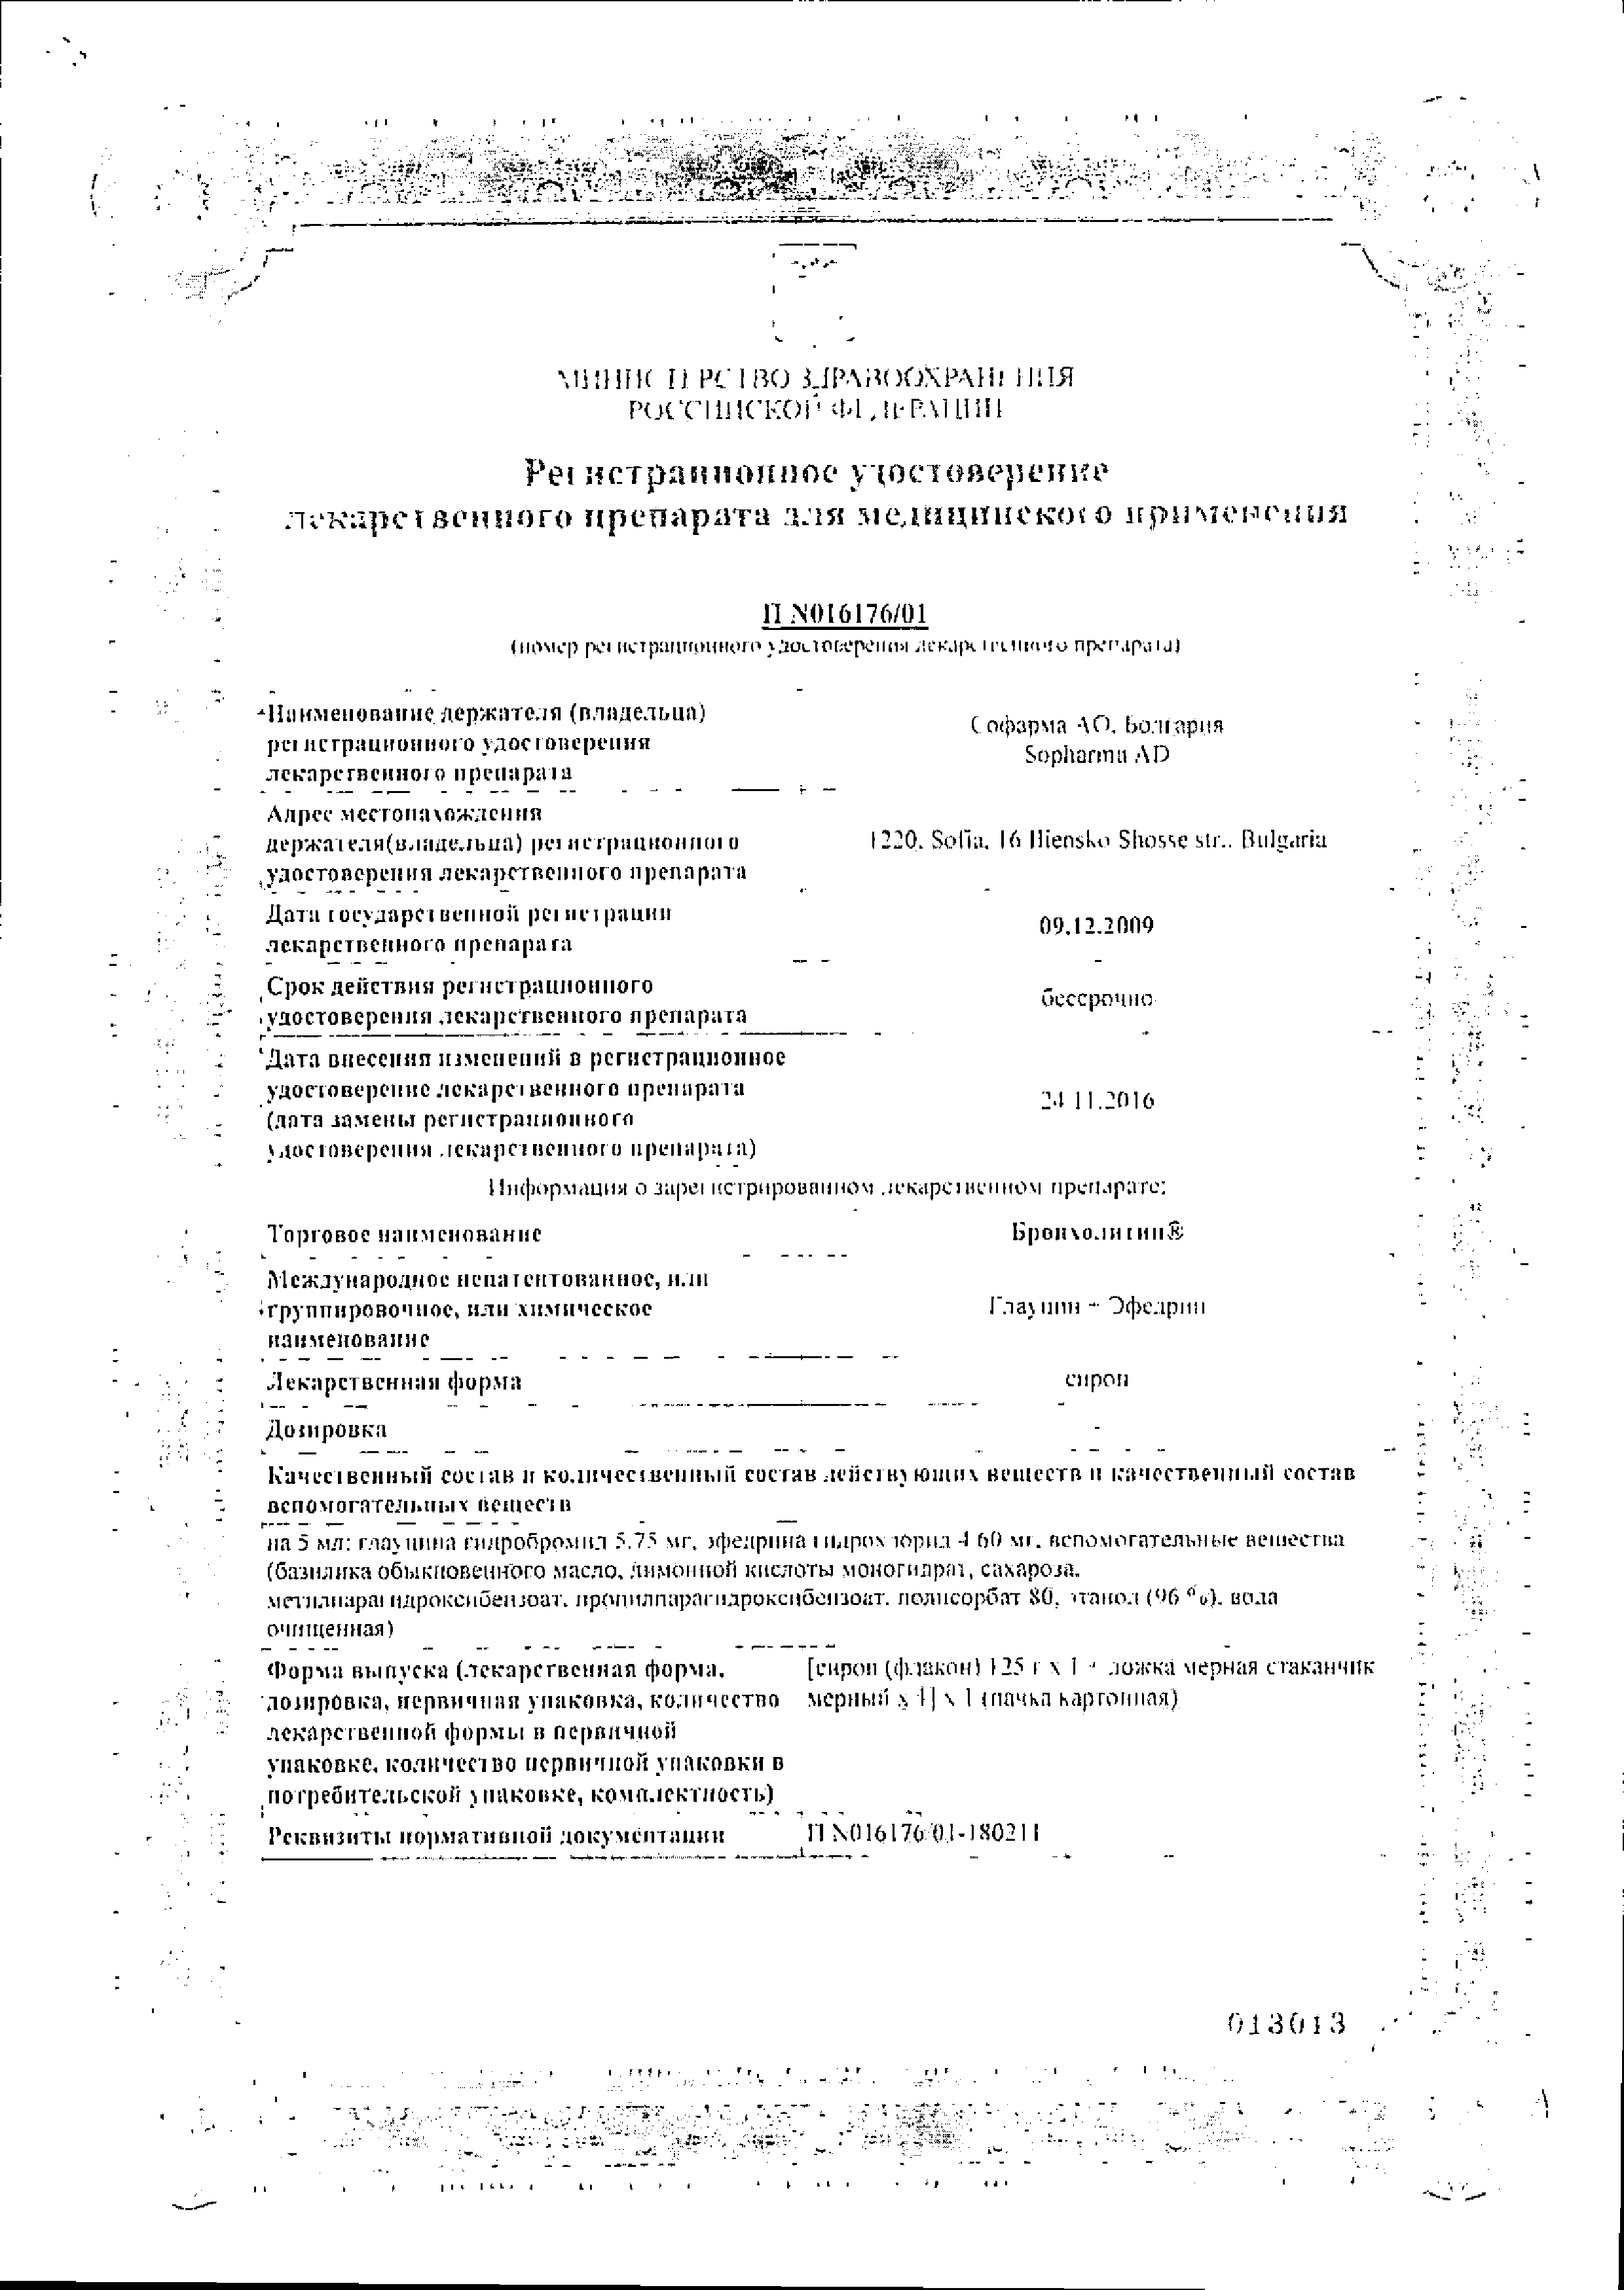 Бронхолитин сертификат